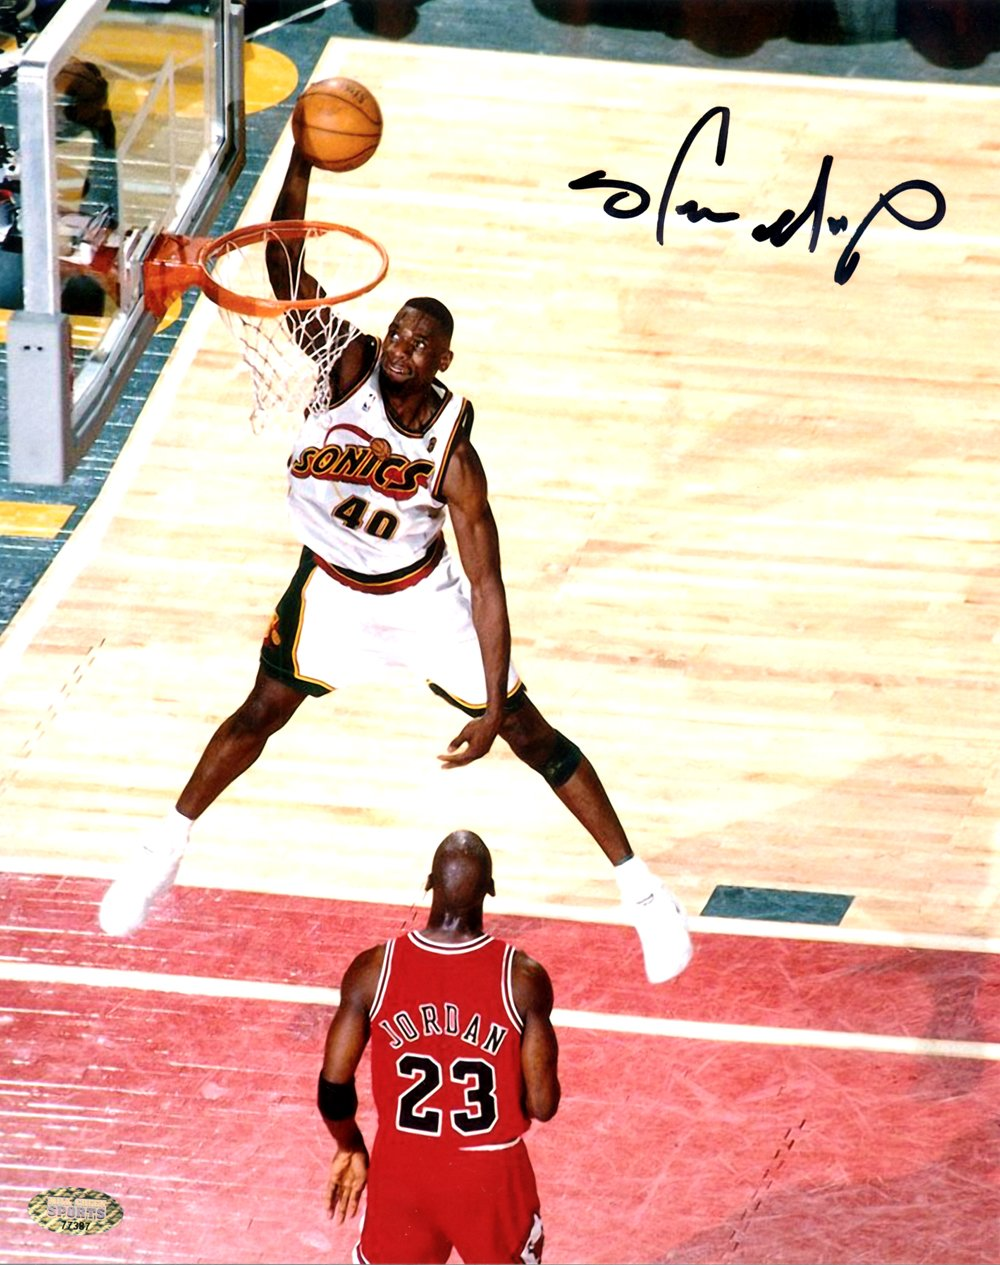 Shawn Kemp Autographed 8x10 Photo Seattle Sonics Sports Basketball Nba Nba Legends